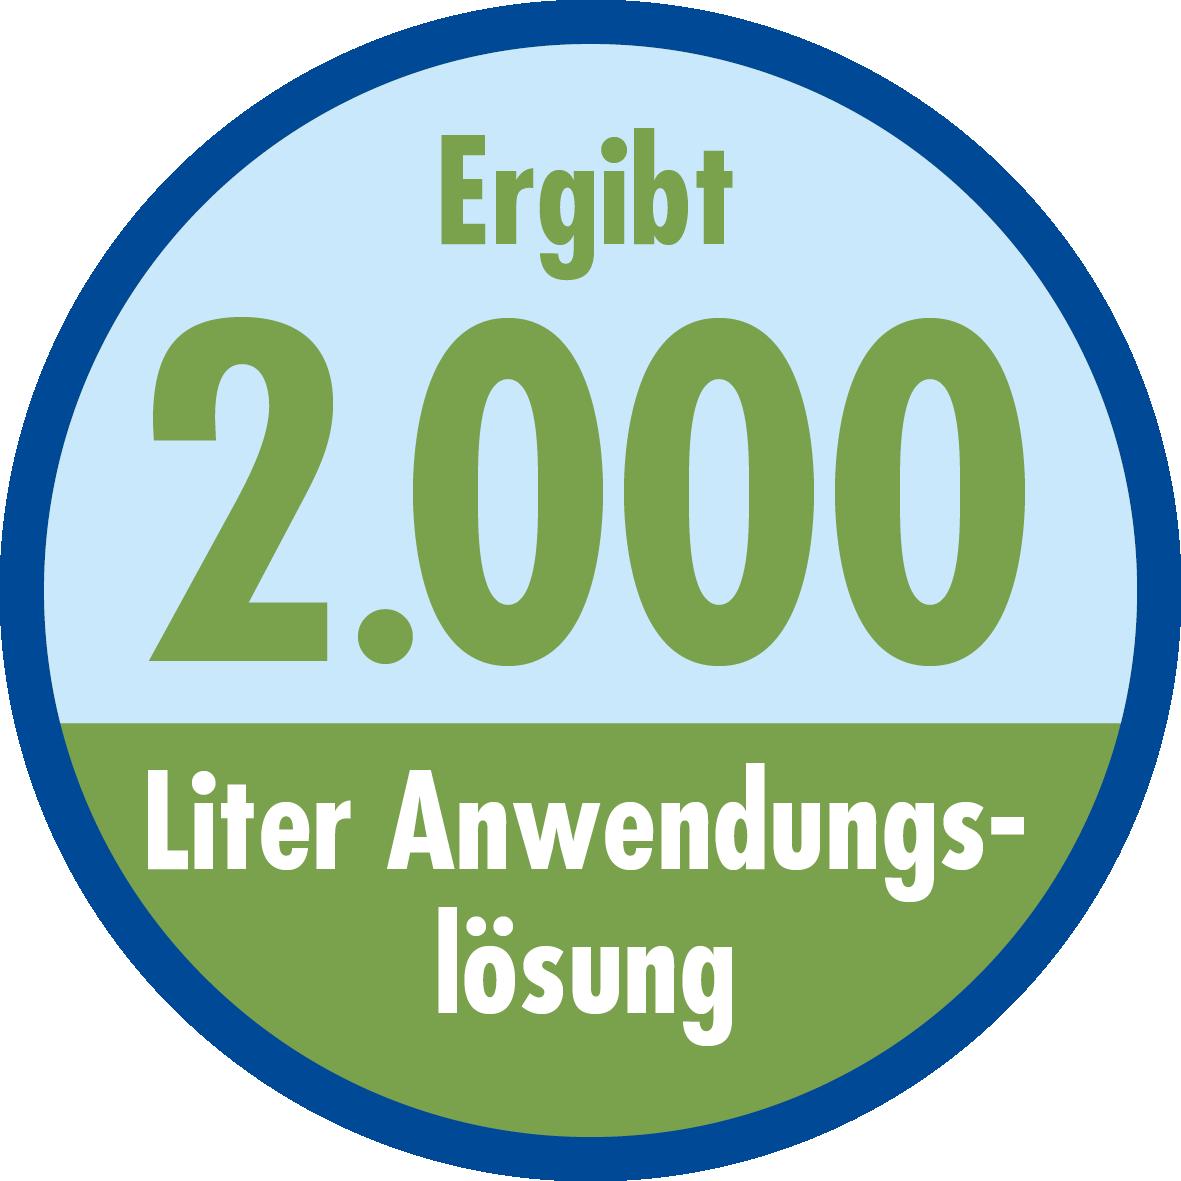 Ergibt 2.000 Liter Anwendungslösung